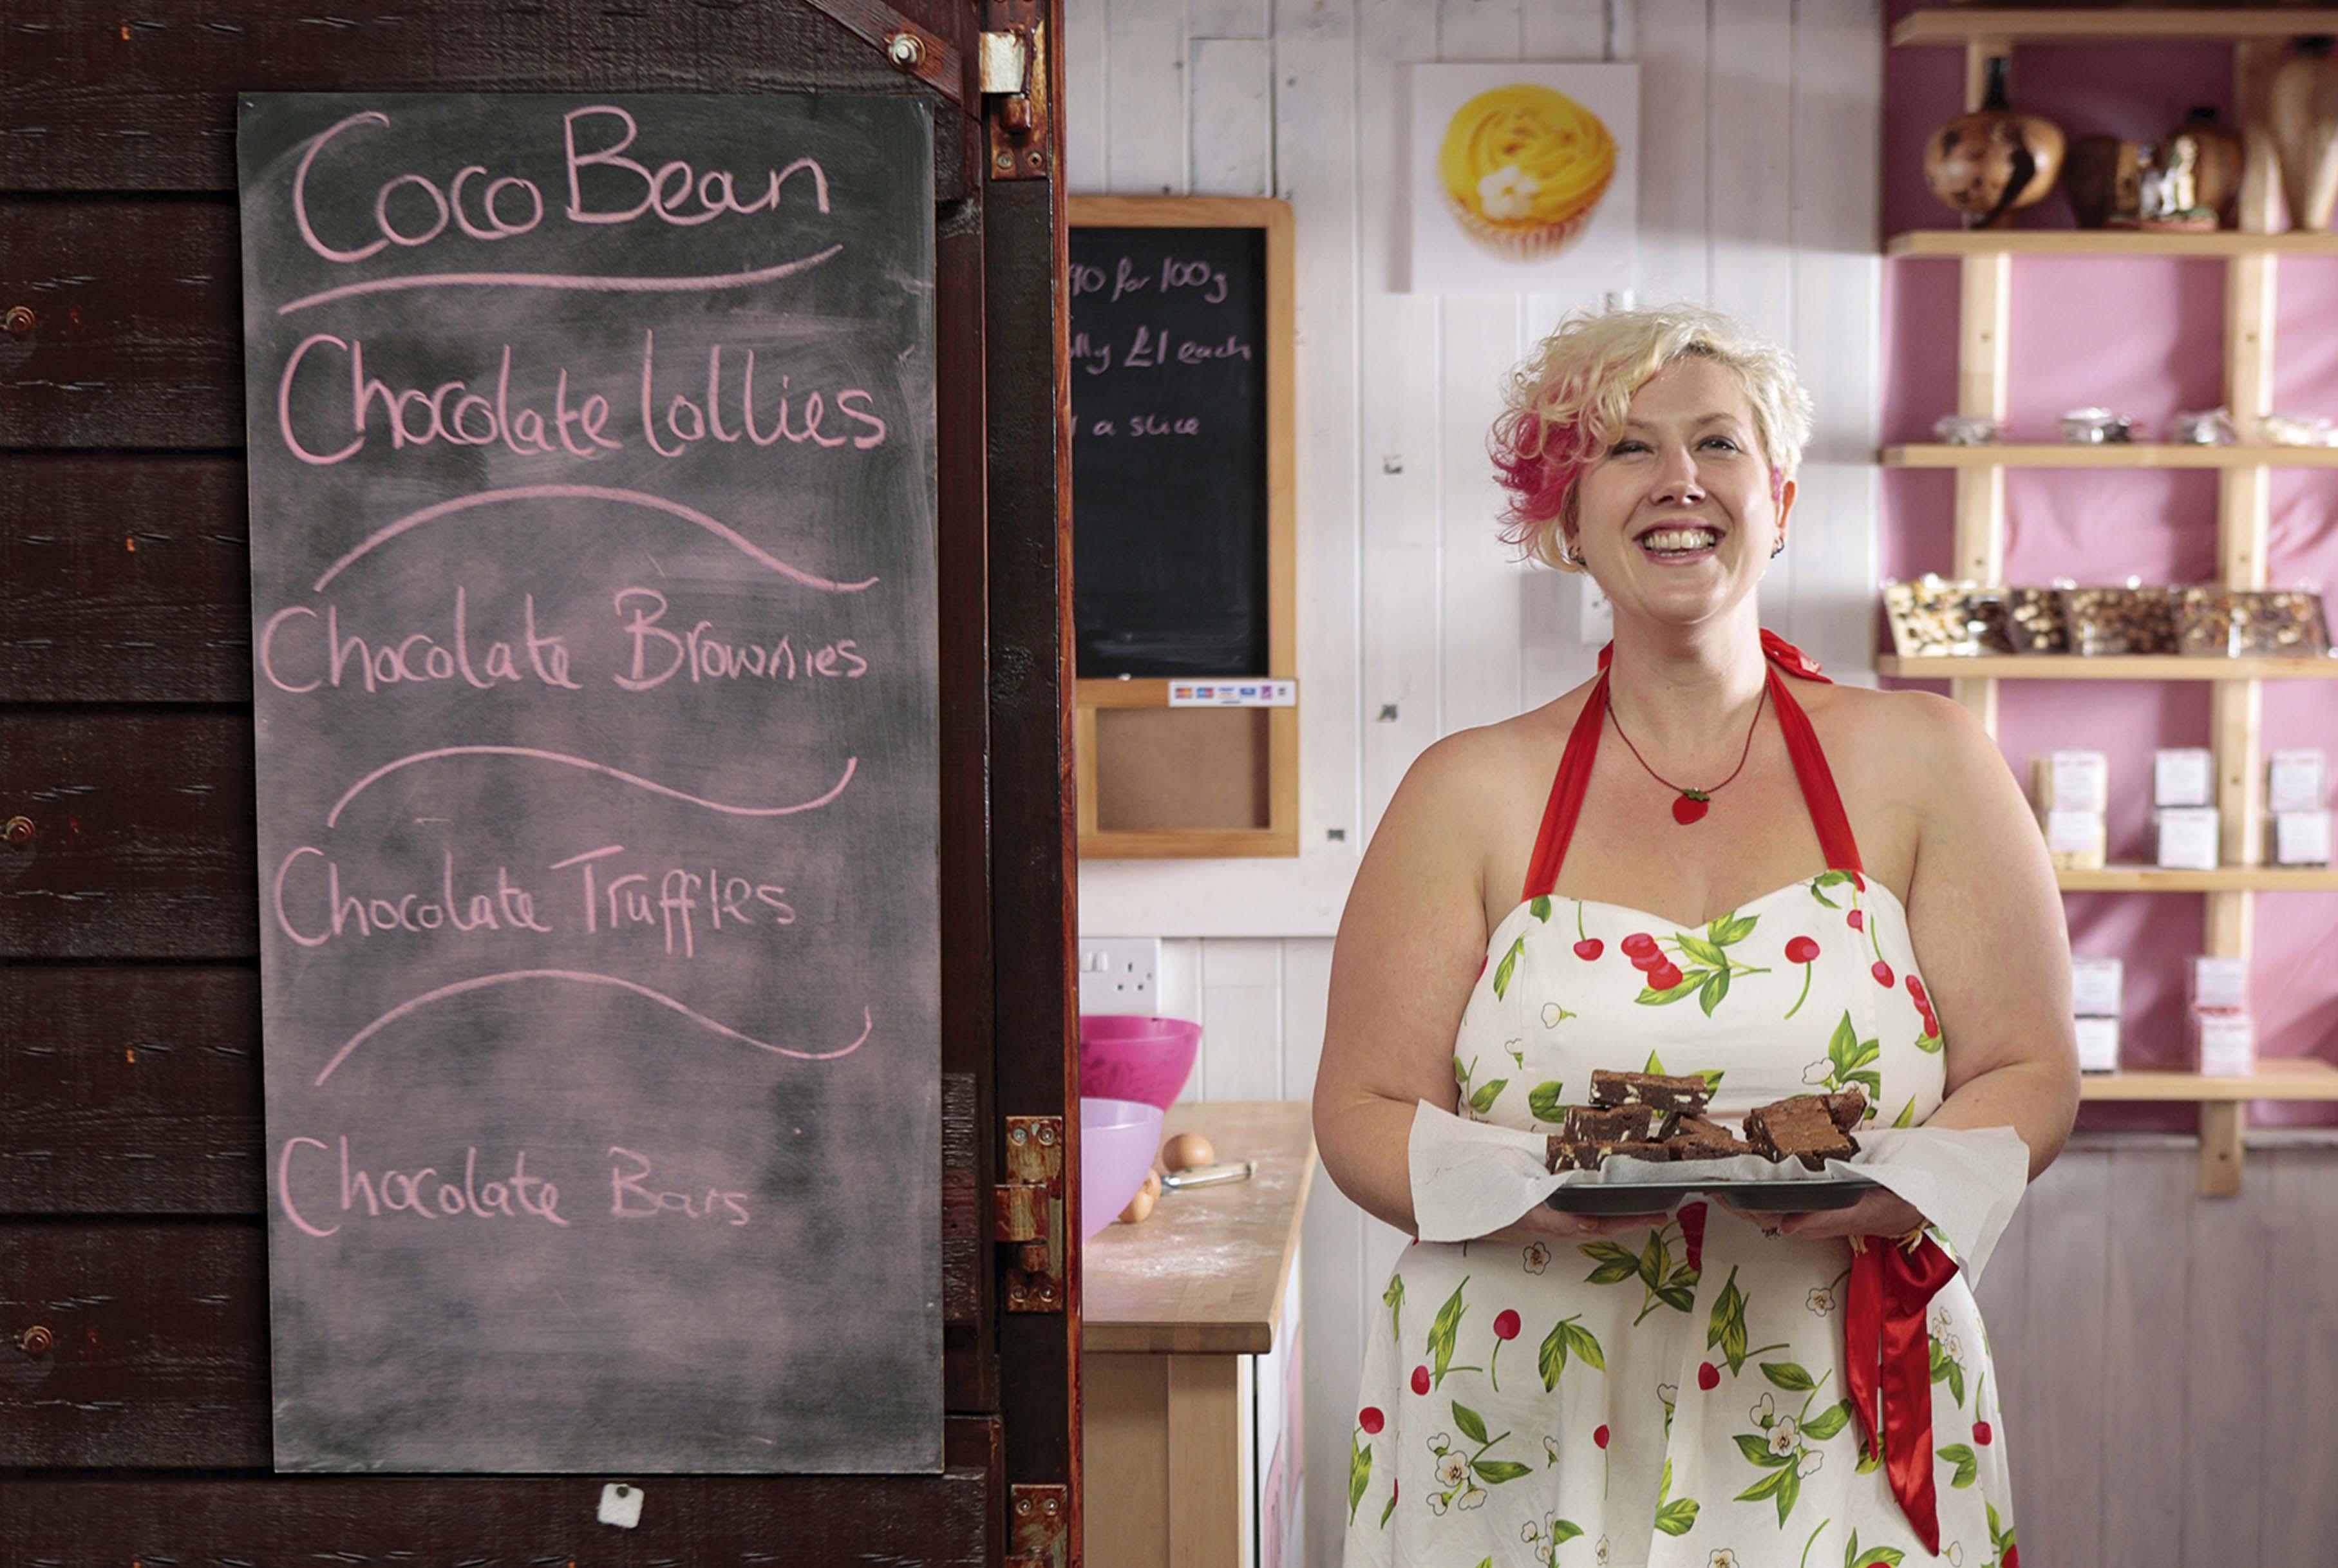 Ruth Campion-Clement, Coco Bean, True Taste Awards 2010.